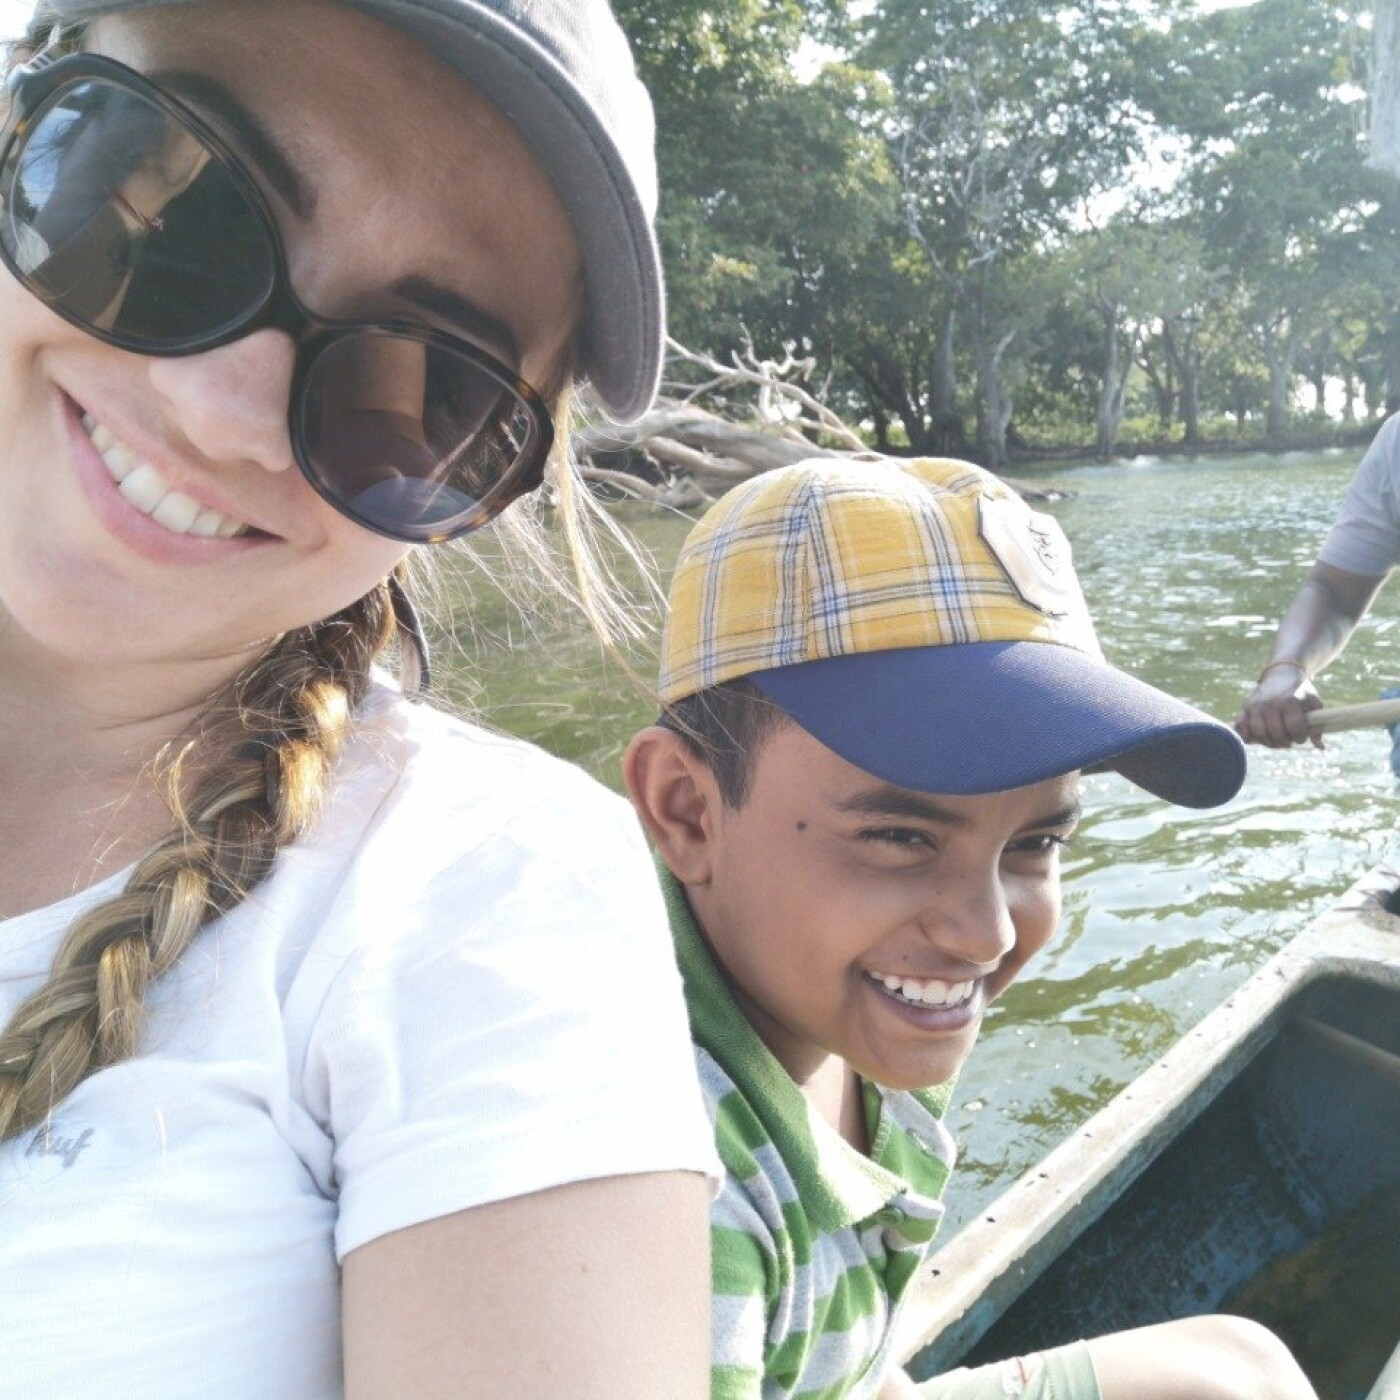 Clémence, correspondante au Sri Lanka, parle du tourisme et du pays - 09 07 2021 - StereoChic Radio